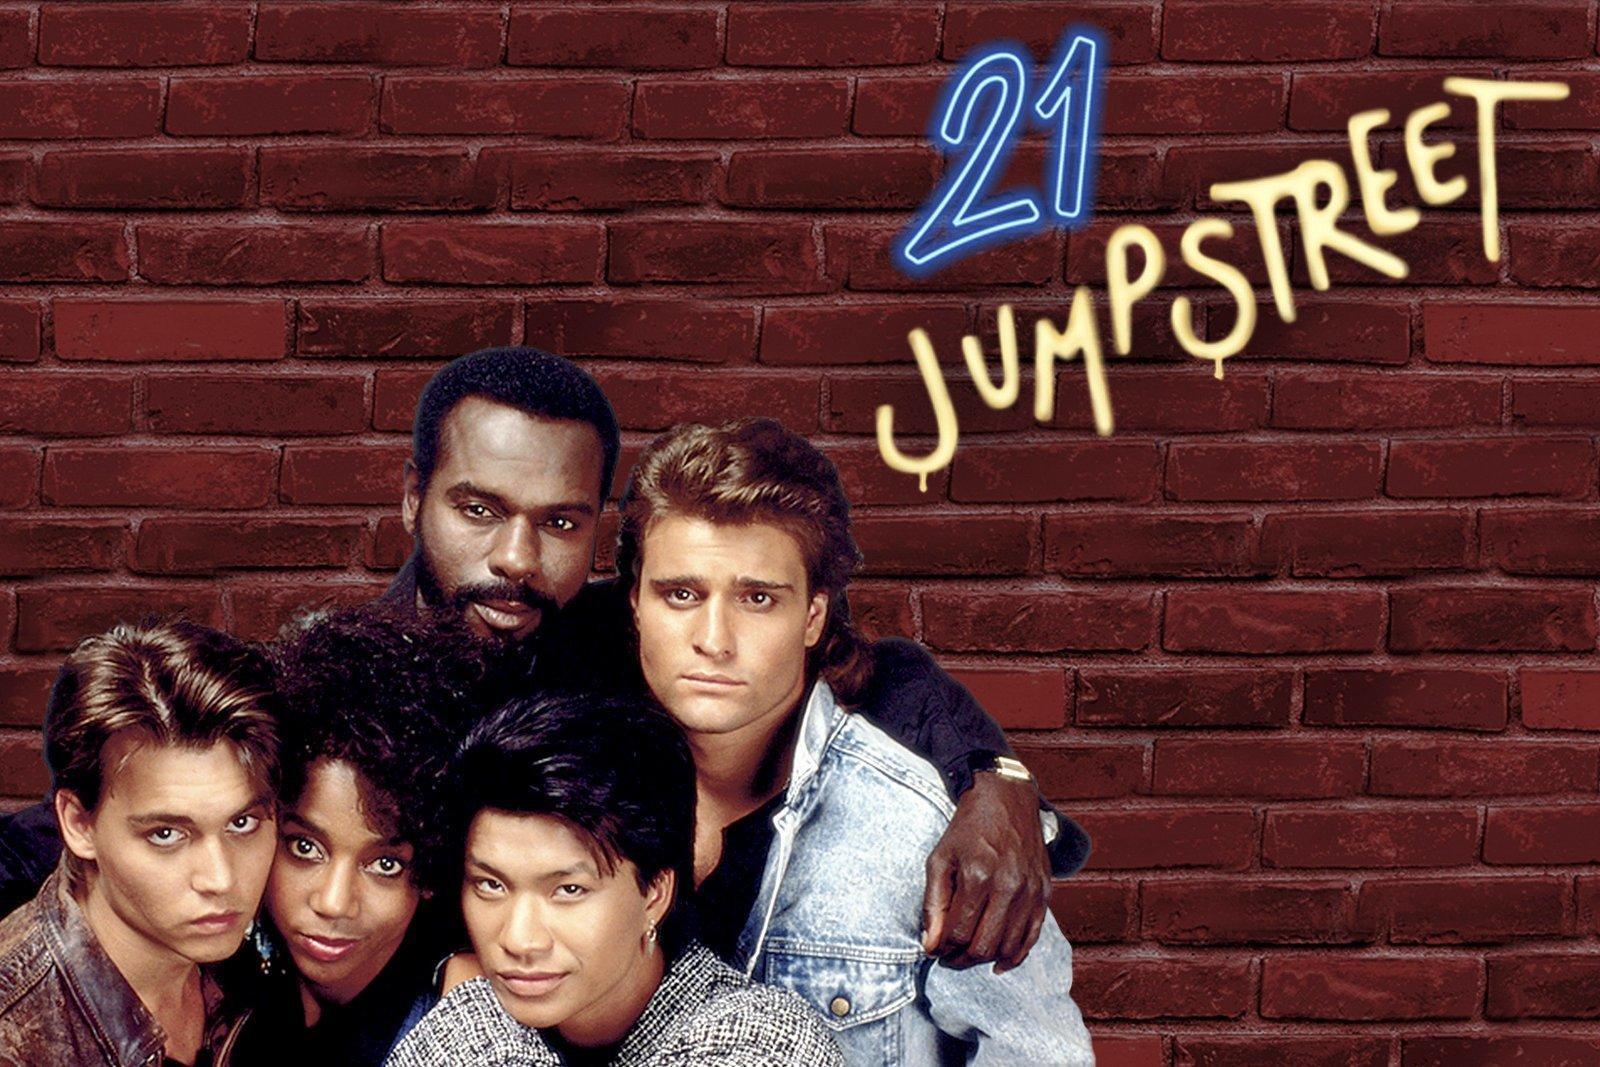 The original 21 Jump Street TV series